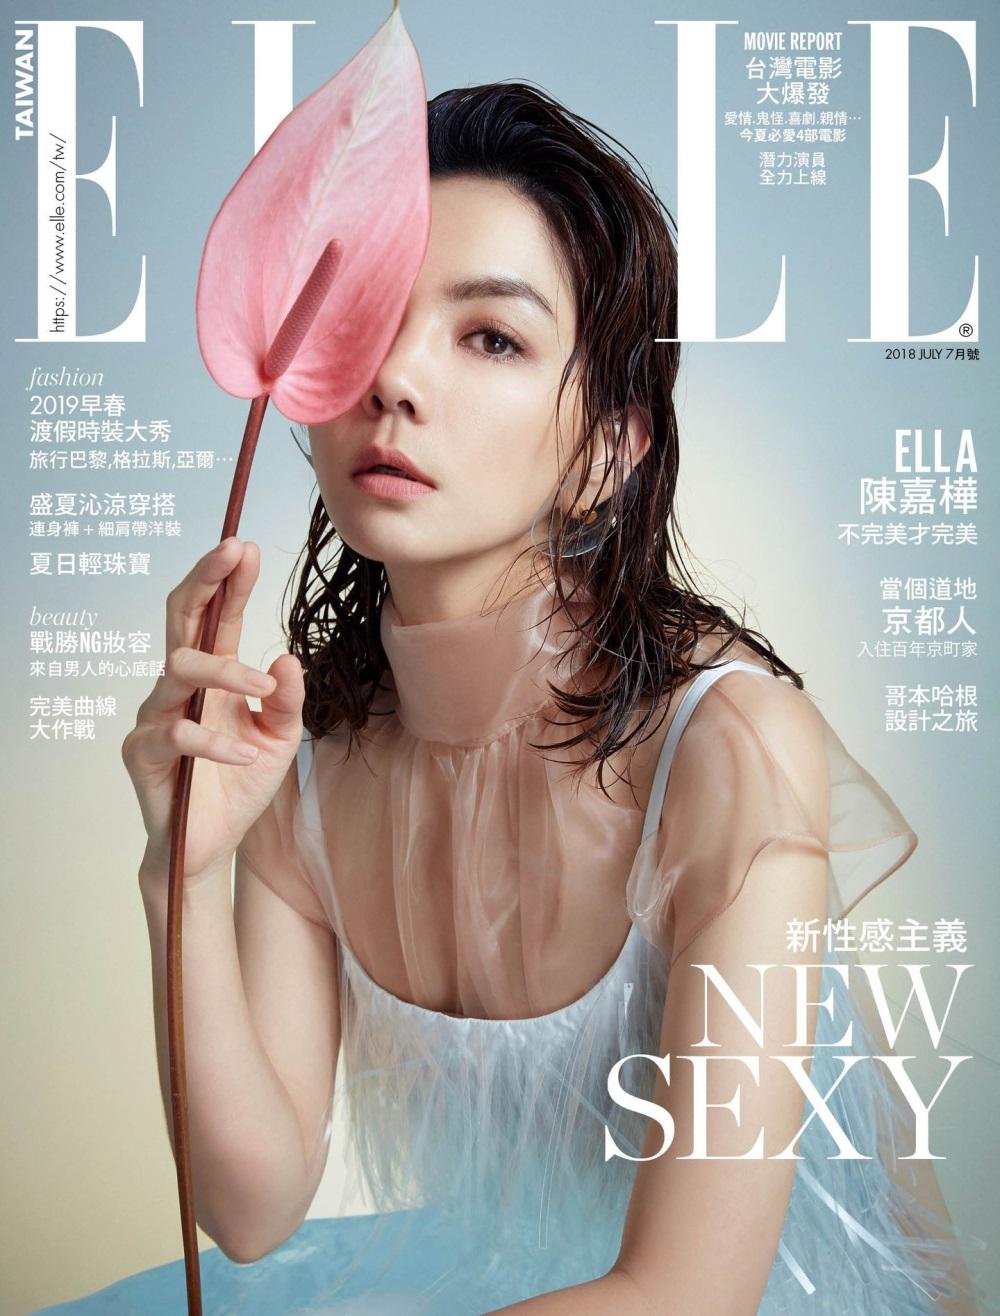 ELLE她 7月號/2018 第322期 時尚版